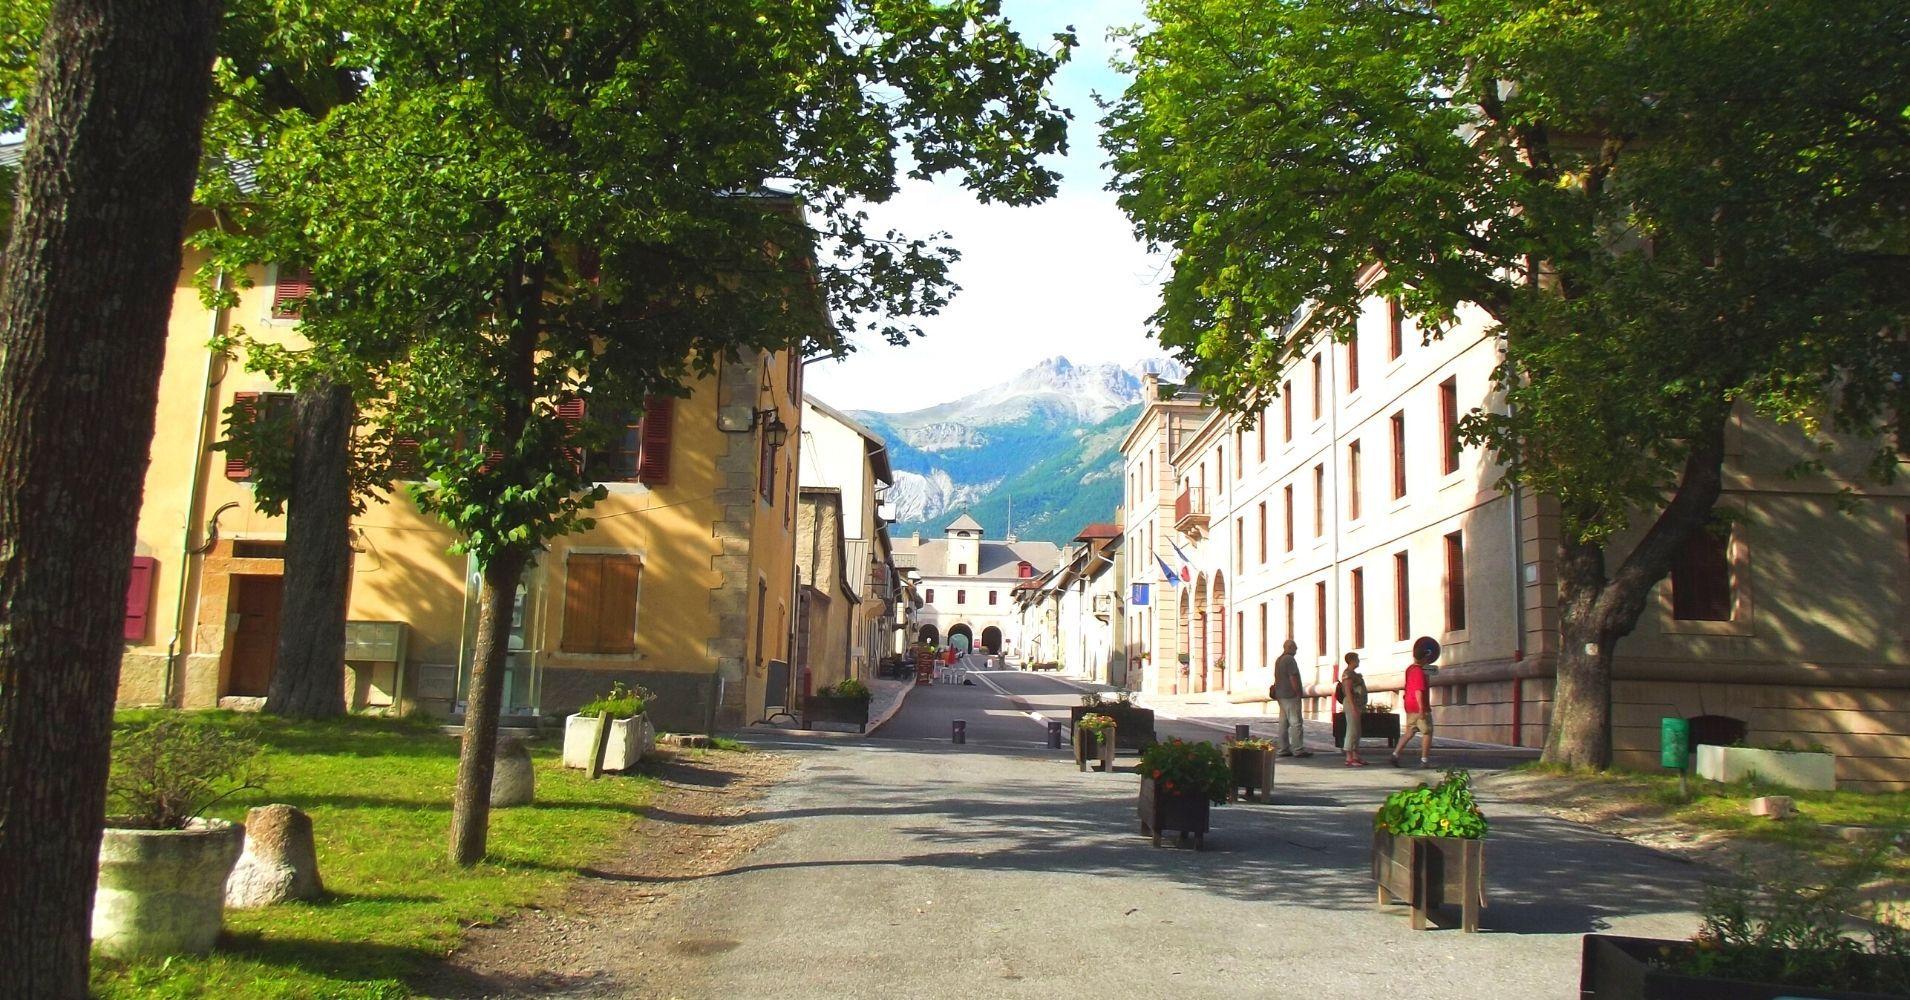 Mont Dauphin Fuerte Vauban. Altos Alpes. Provenza-Alpes-Costa Azul. Francia.